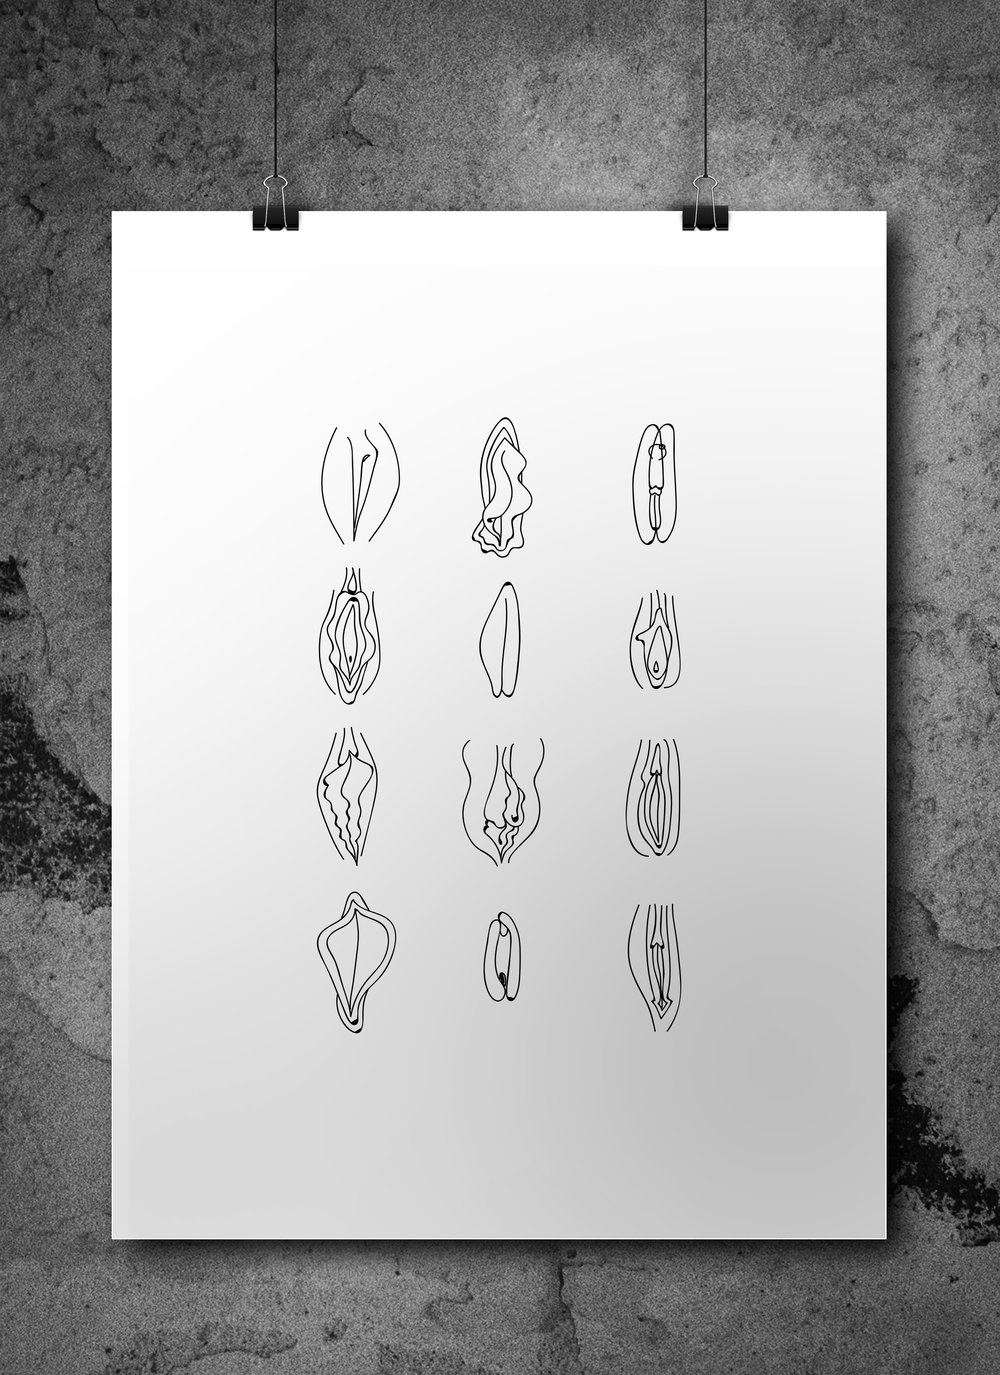 Poster Mockup-vaginaer.jpg